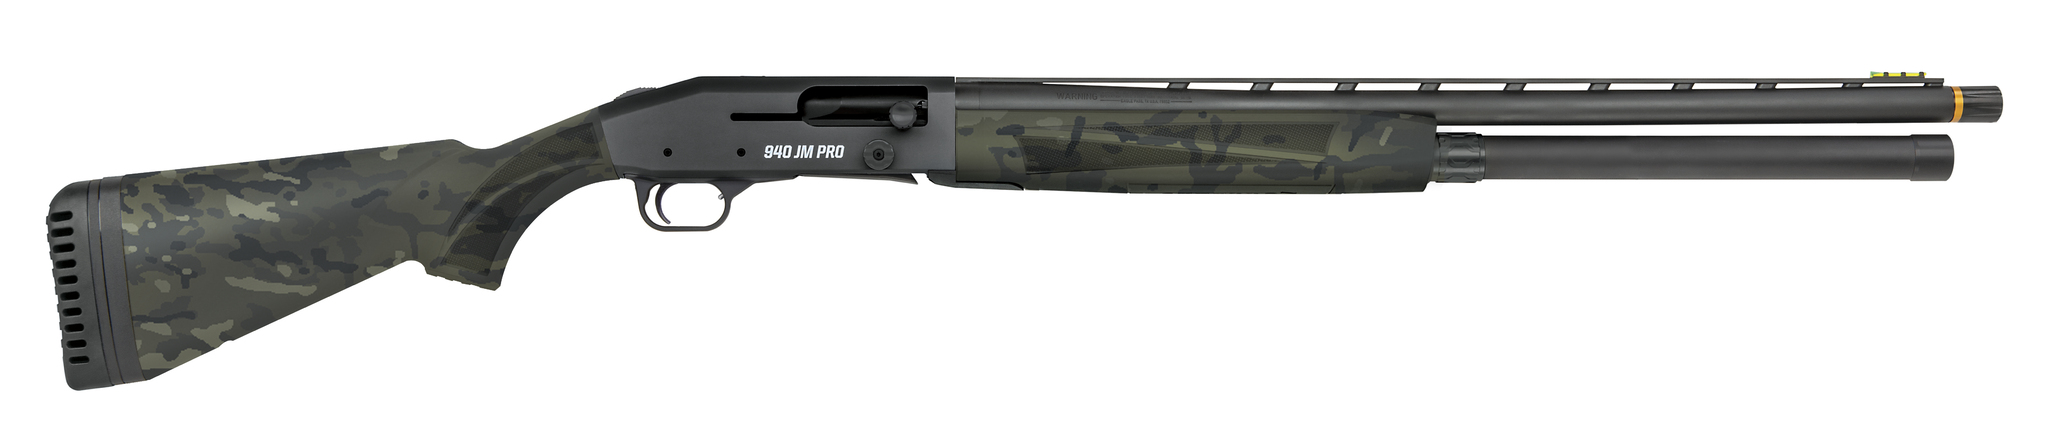 Mossberg Jerry Miculek Pro Series 940 12 Gauge